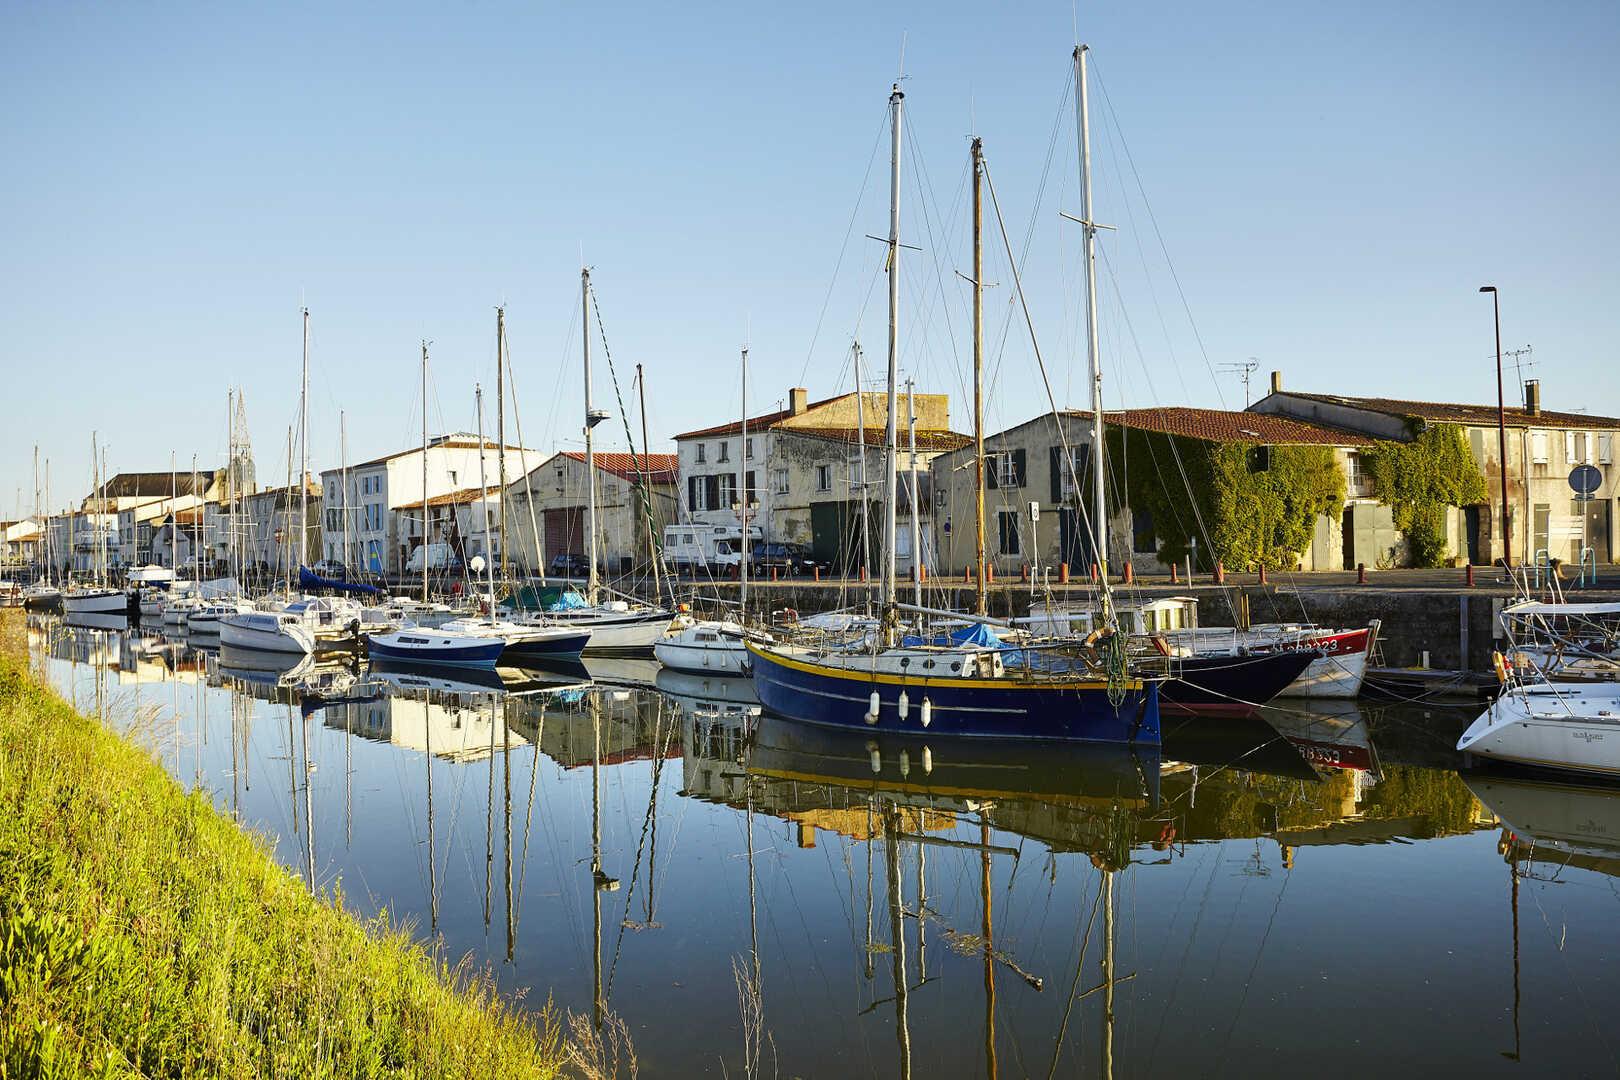 Itineraire Velo Avec Voie Verte Marans La Rochelle La Velodyssee